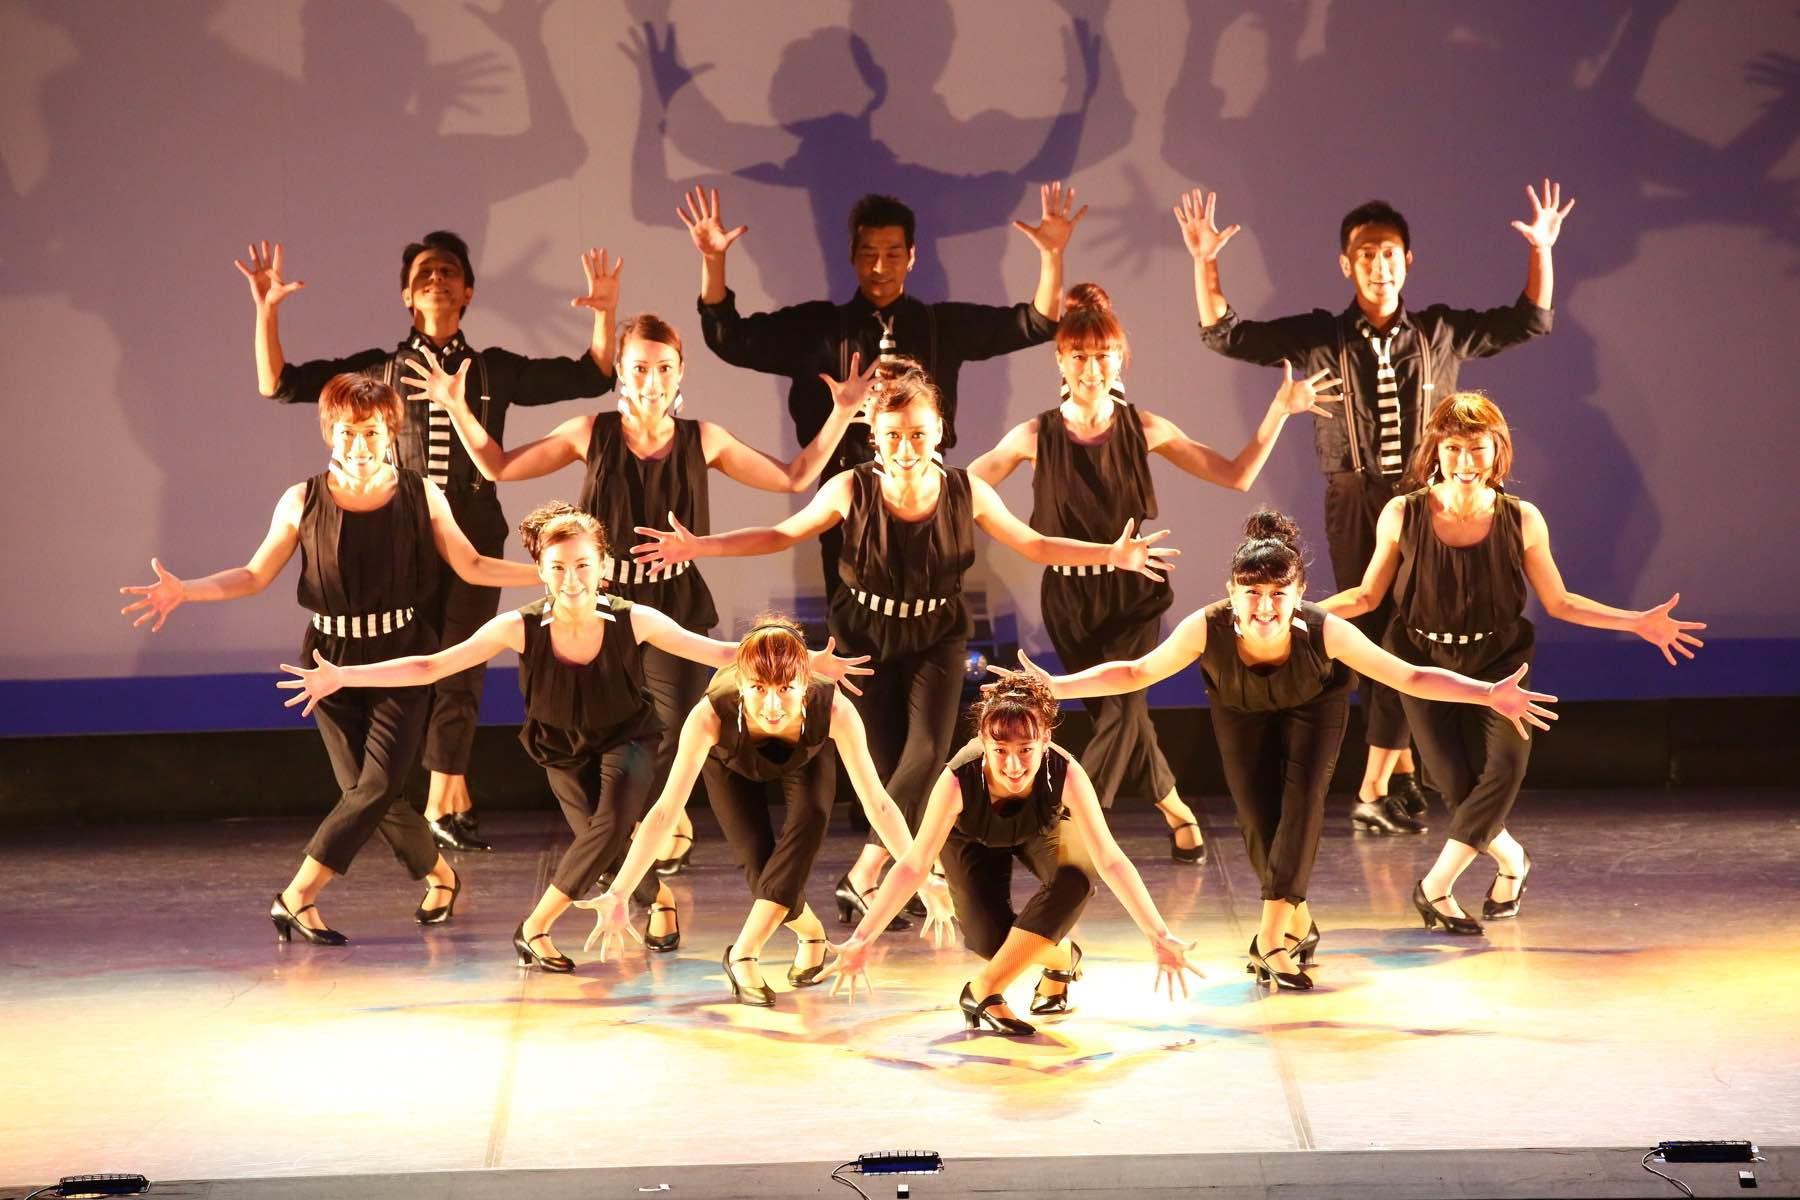 HAND-CLAP DANCE GYM